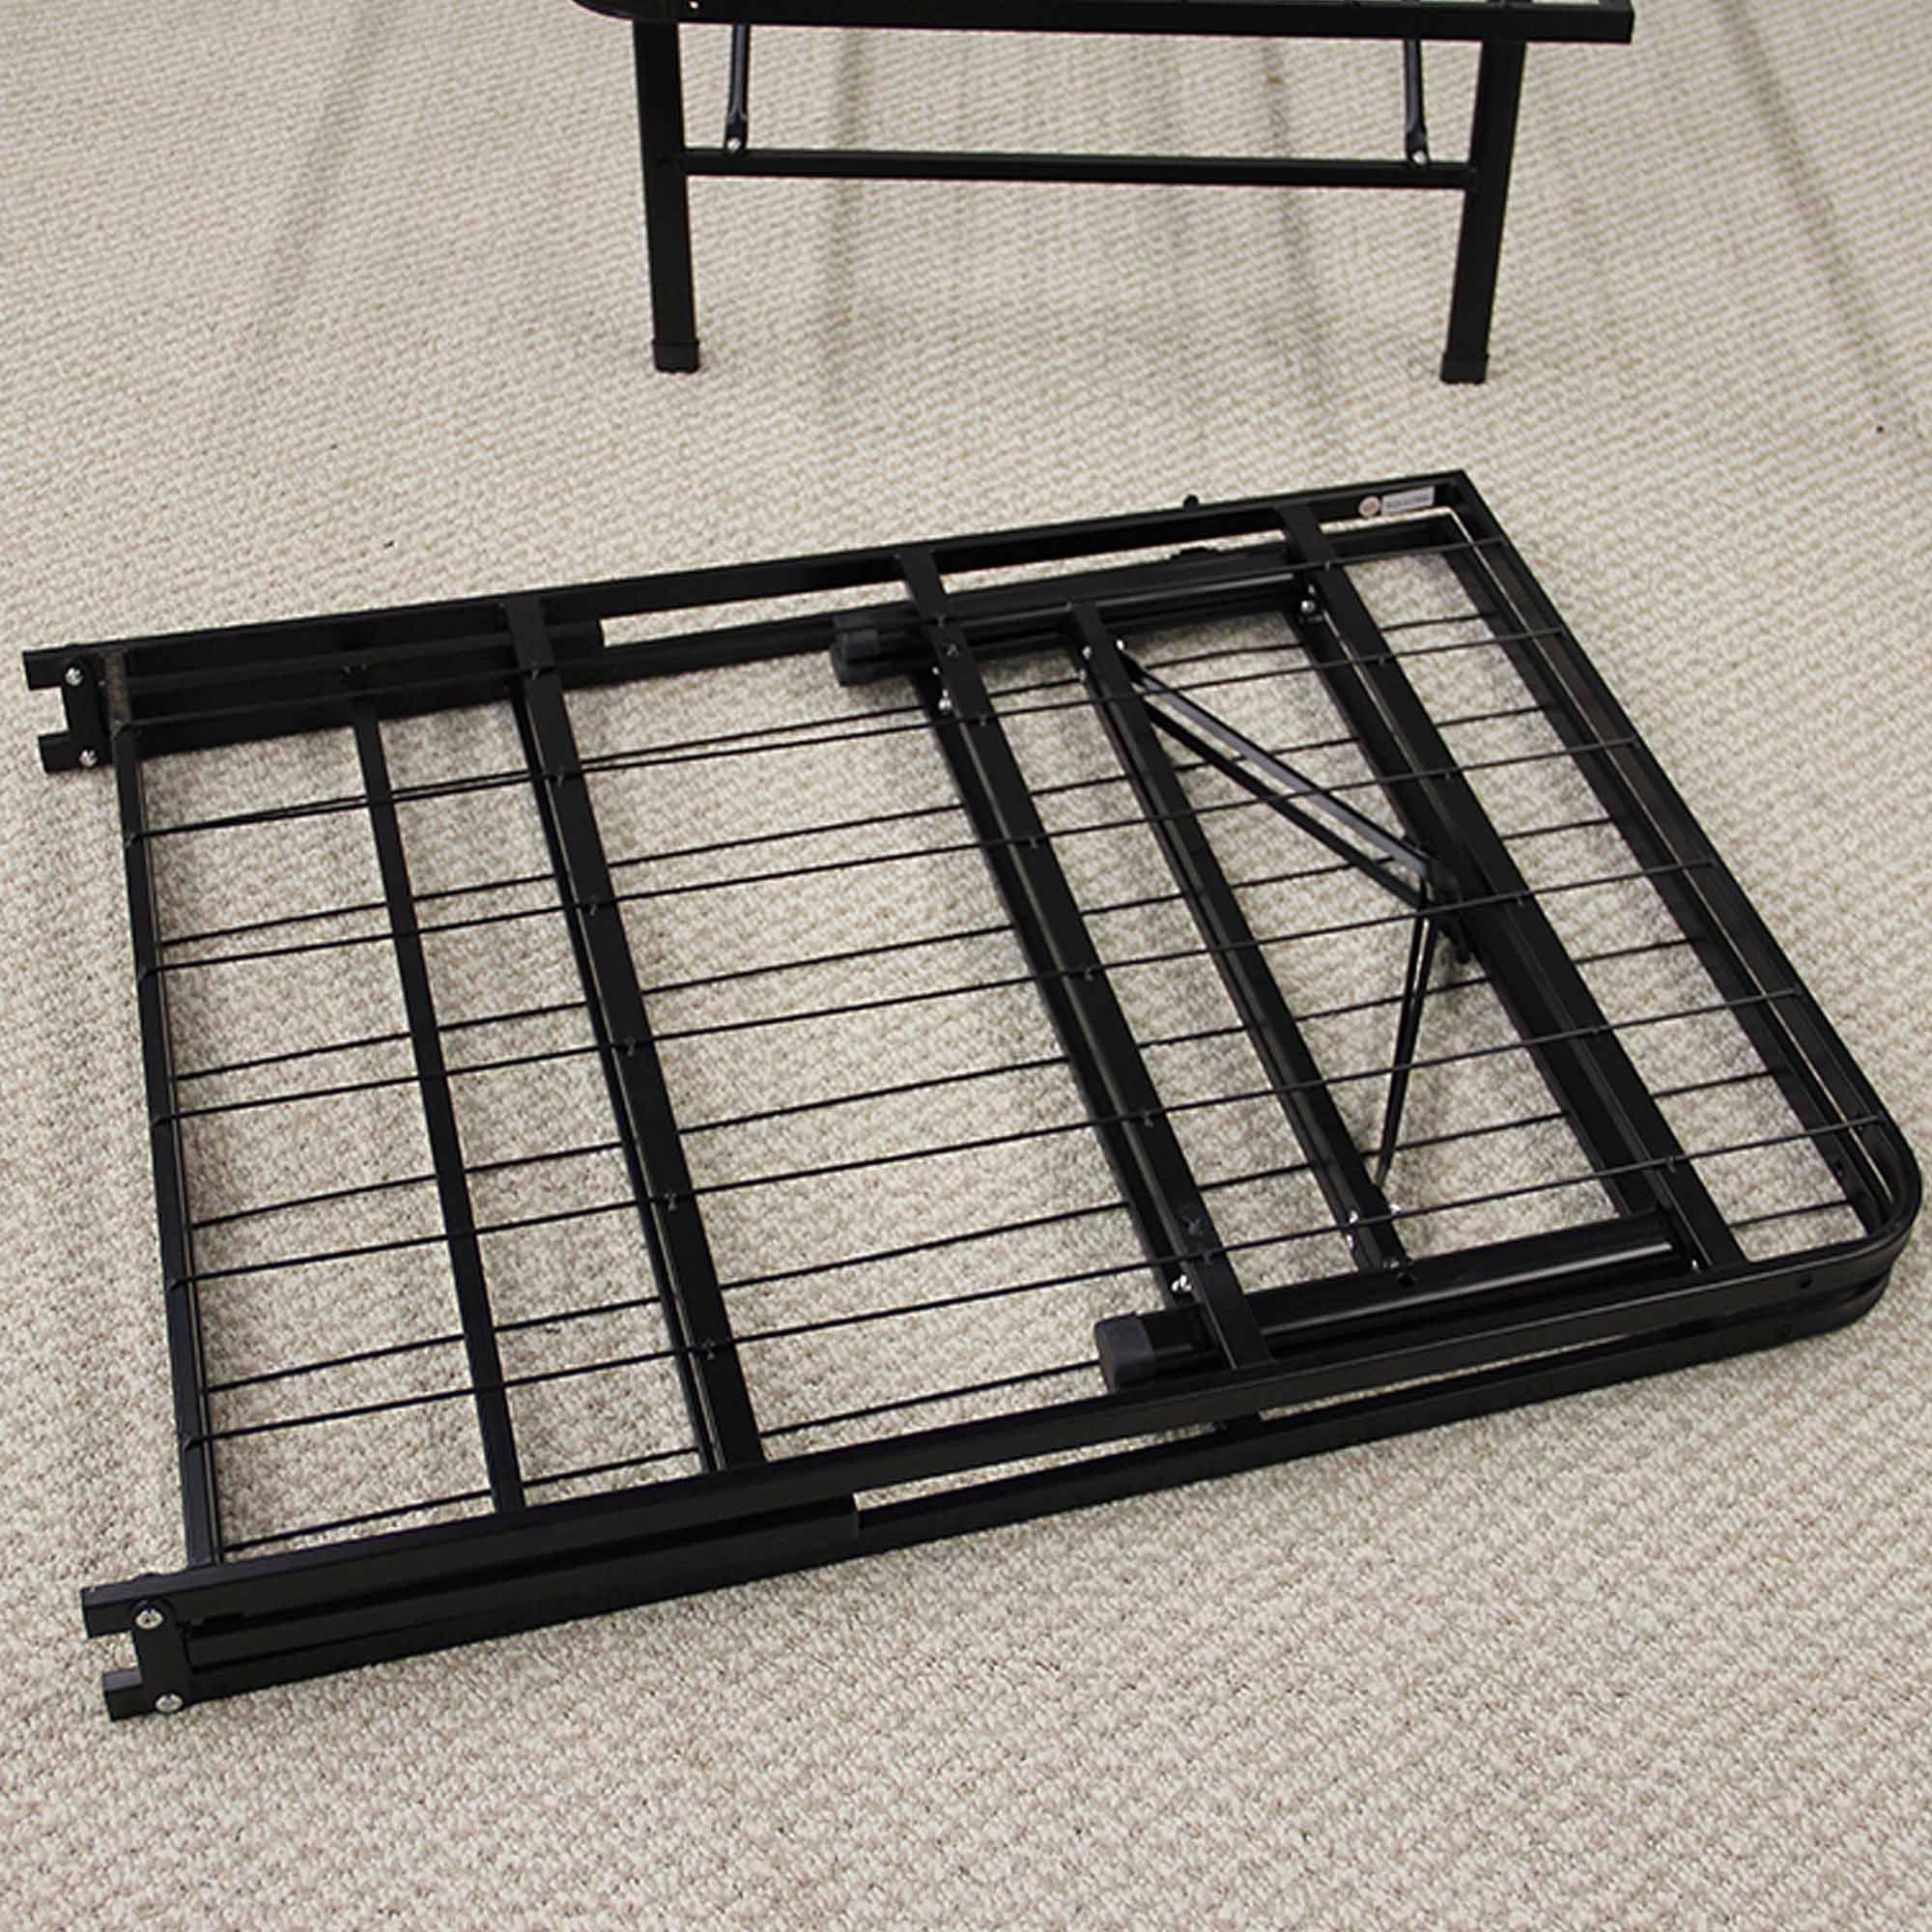 modern sleep platform metal bed frame mattress foundation walmartcom - Bed Frame And Box Spring